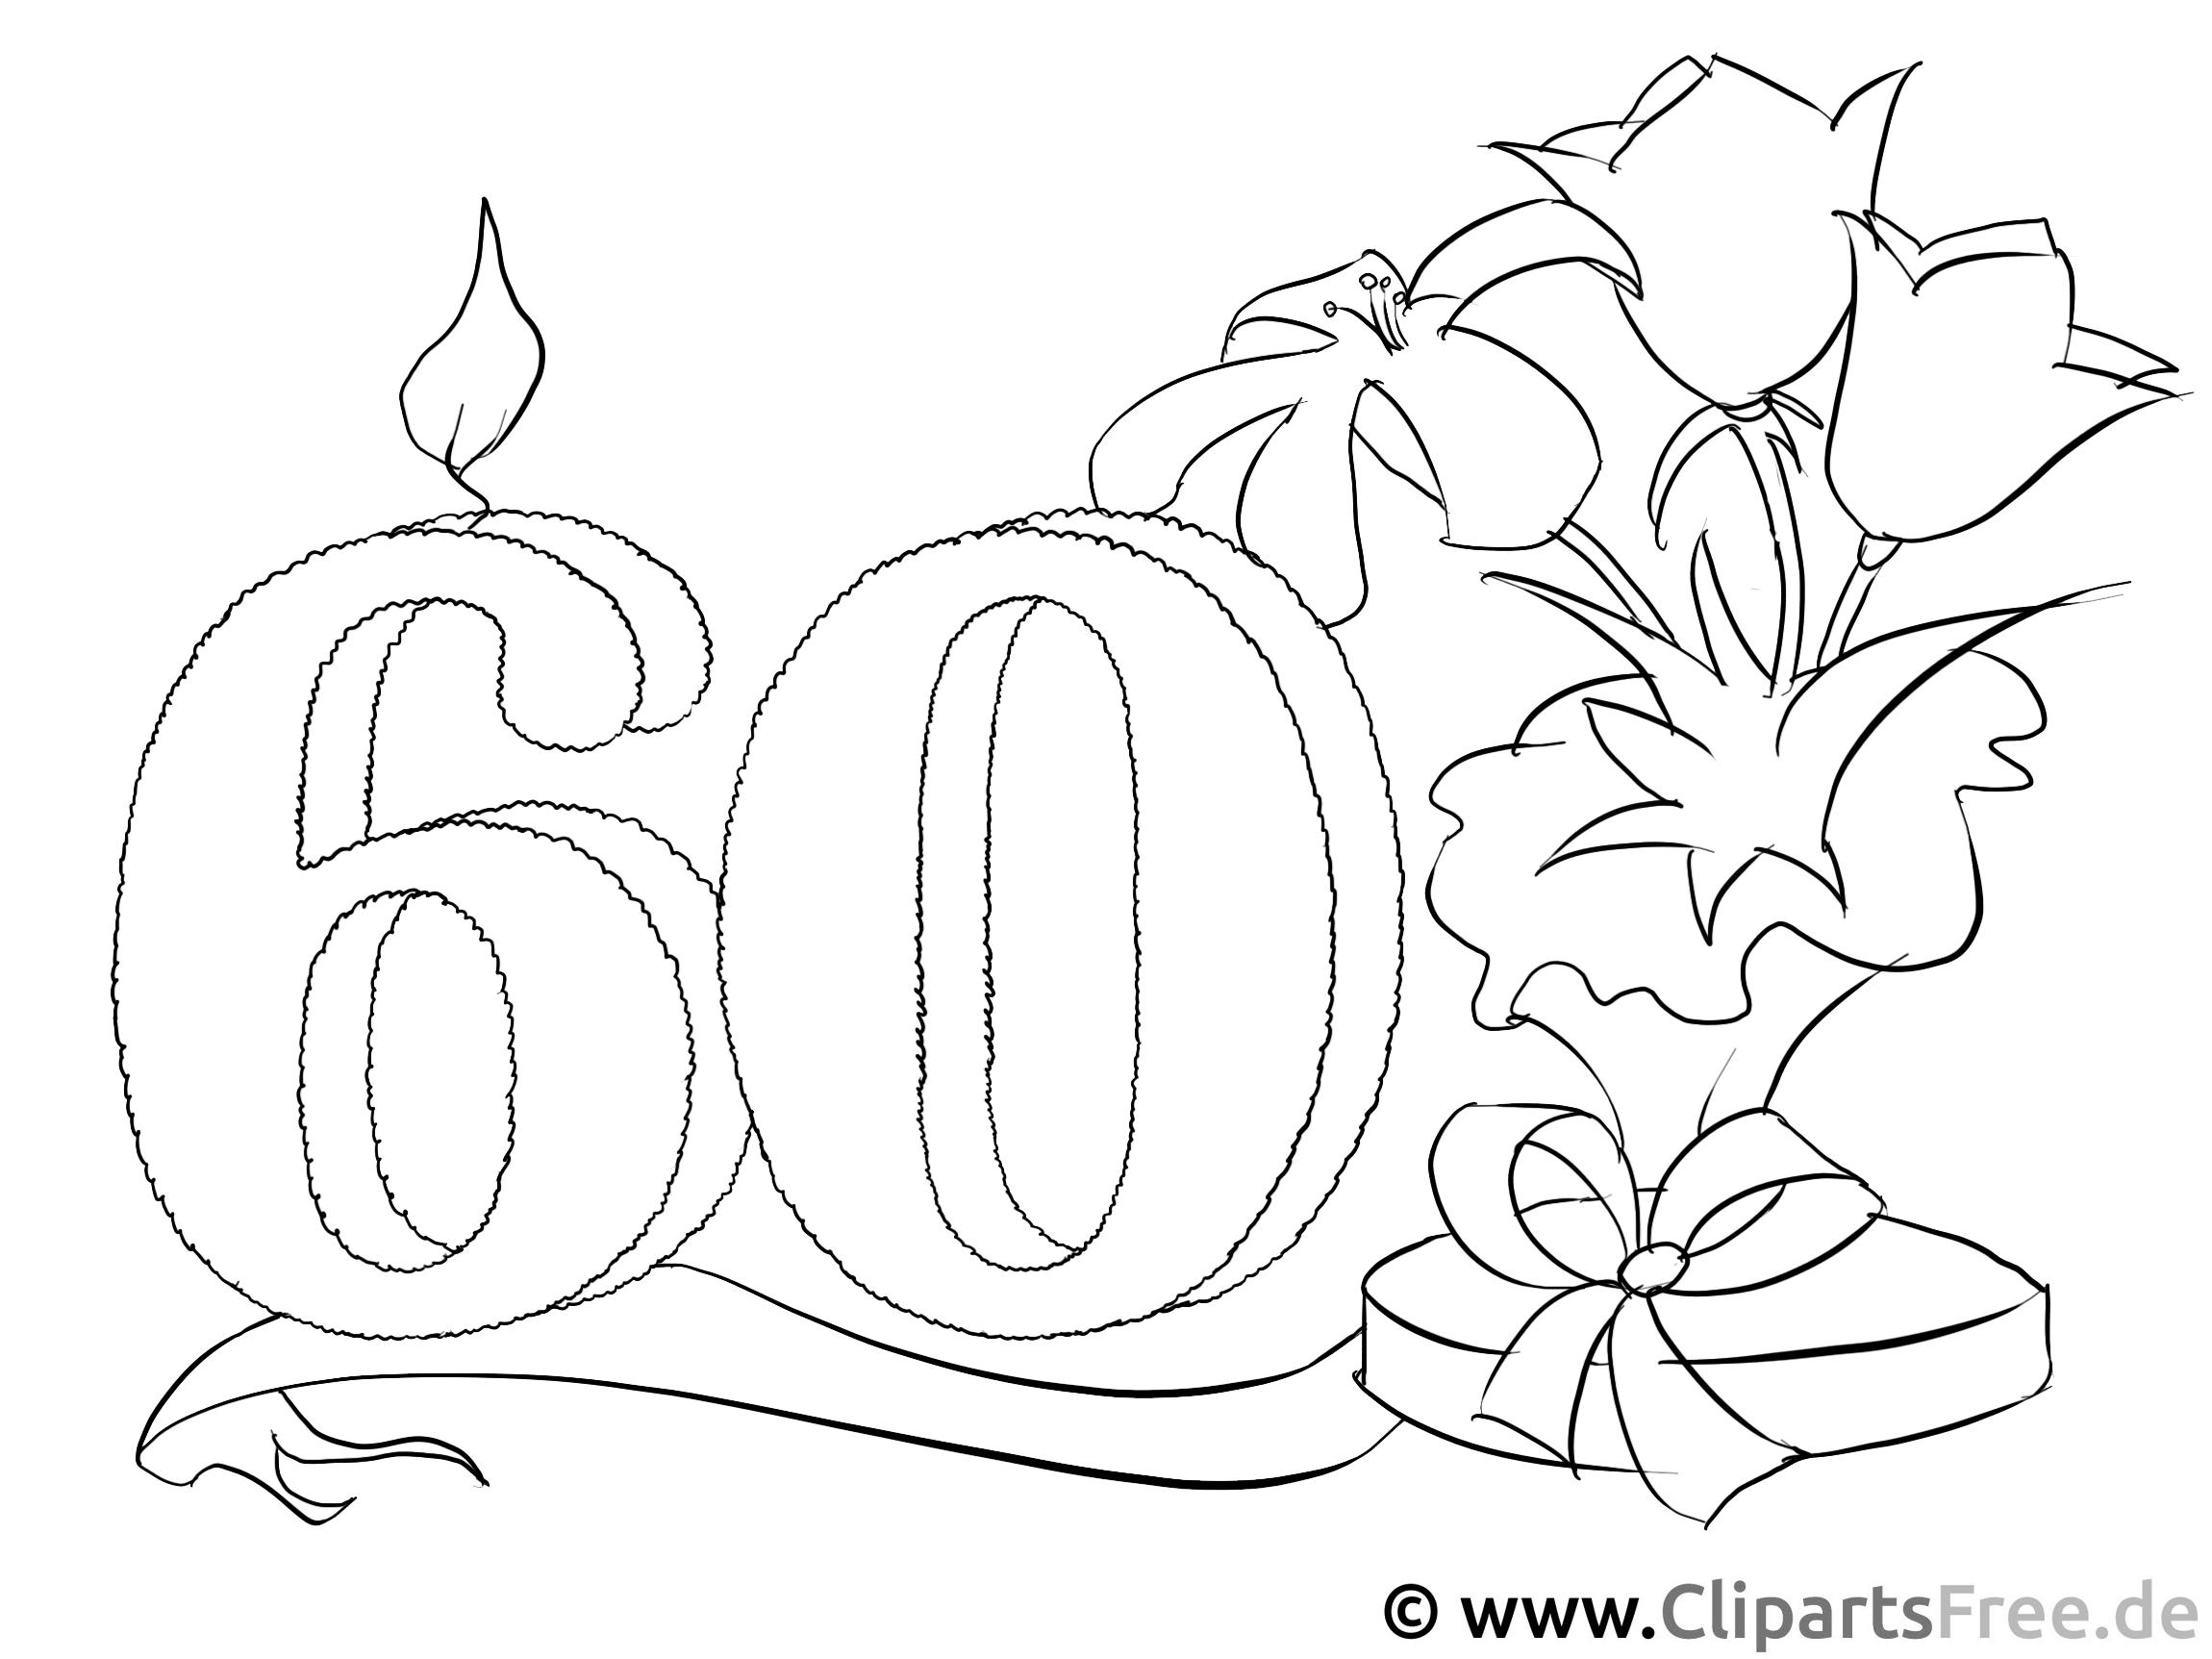 Ausmalbilder Geburtstag 70 : Prima Ausmalbilder Geburtstag Oma